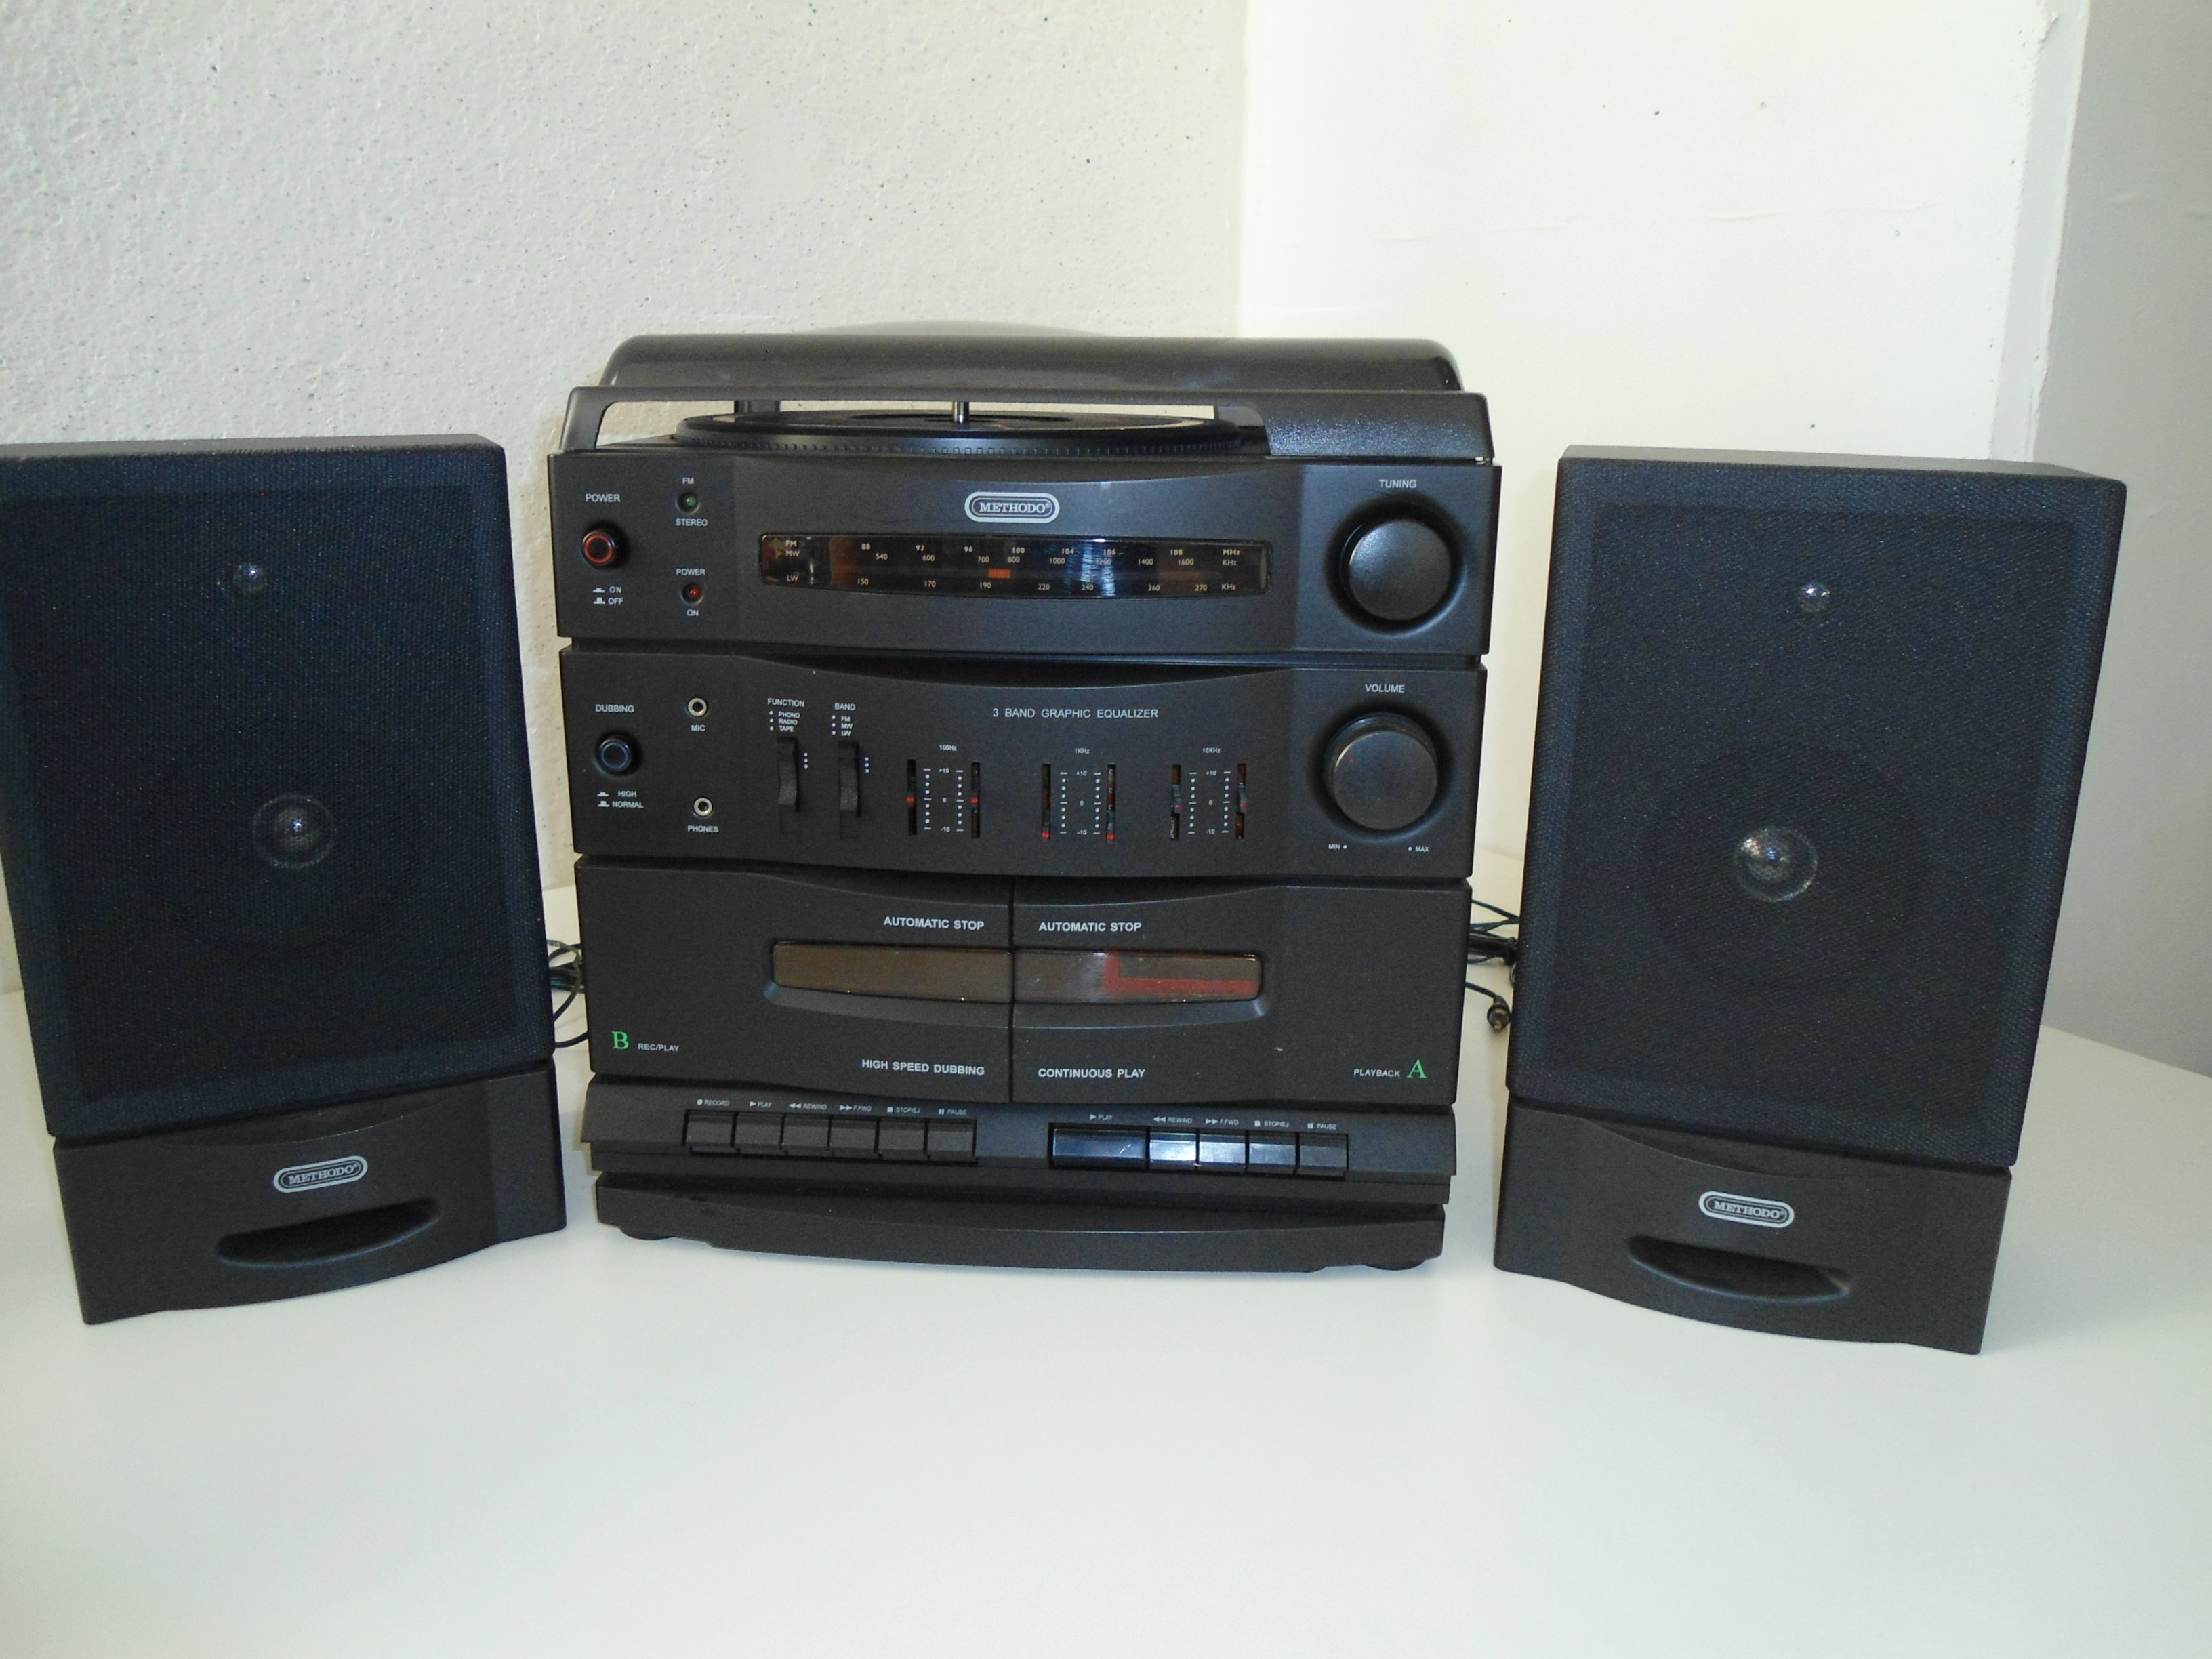 Stereo radio twin cassette mini hi fi system.jpg